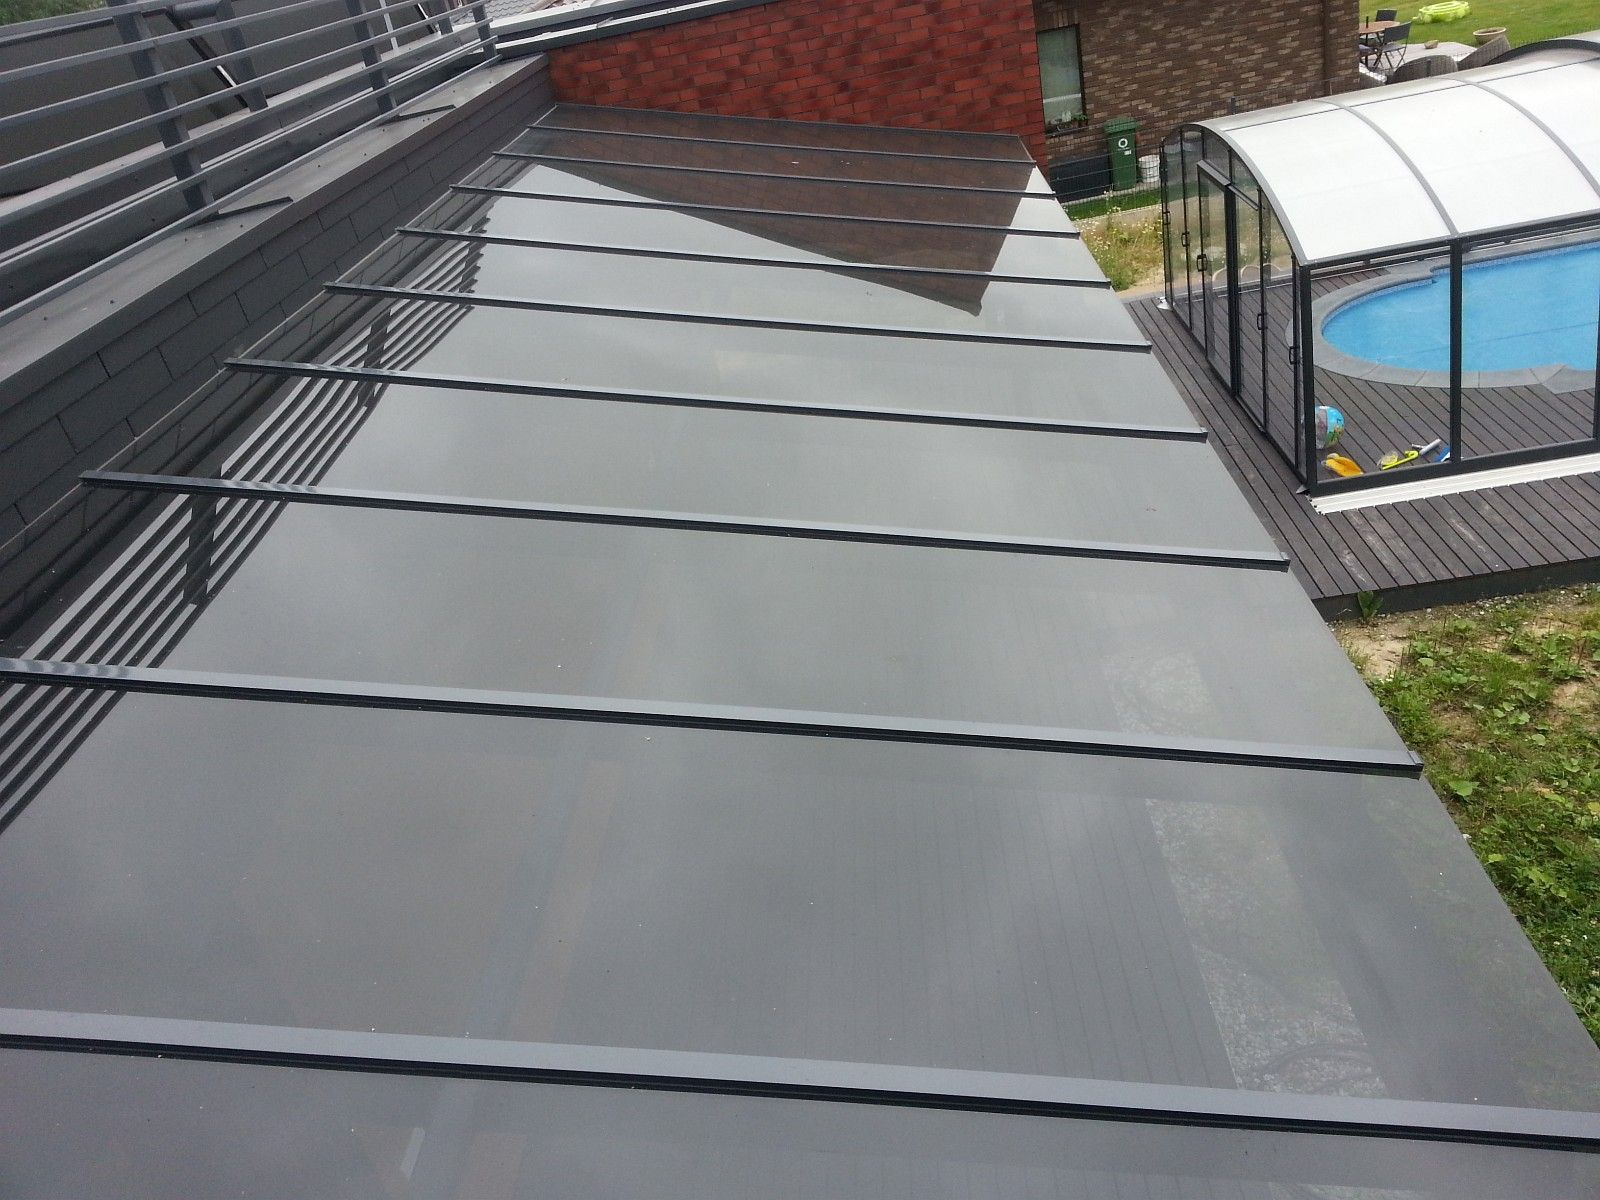 Terrace Glass Roof Glasstak Vintergarden Tak Complete Made Of Safety Glass Prosjekter